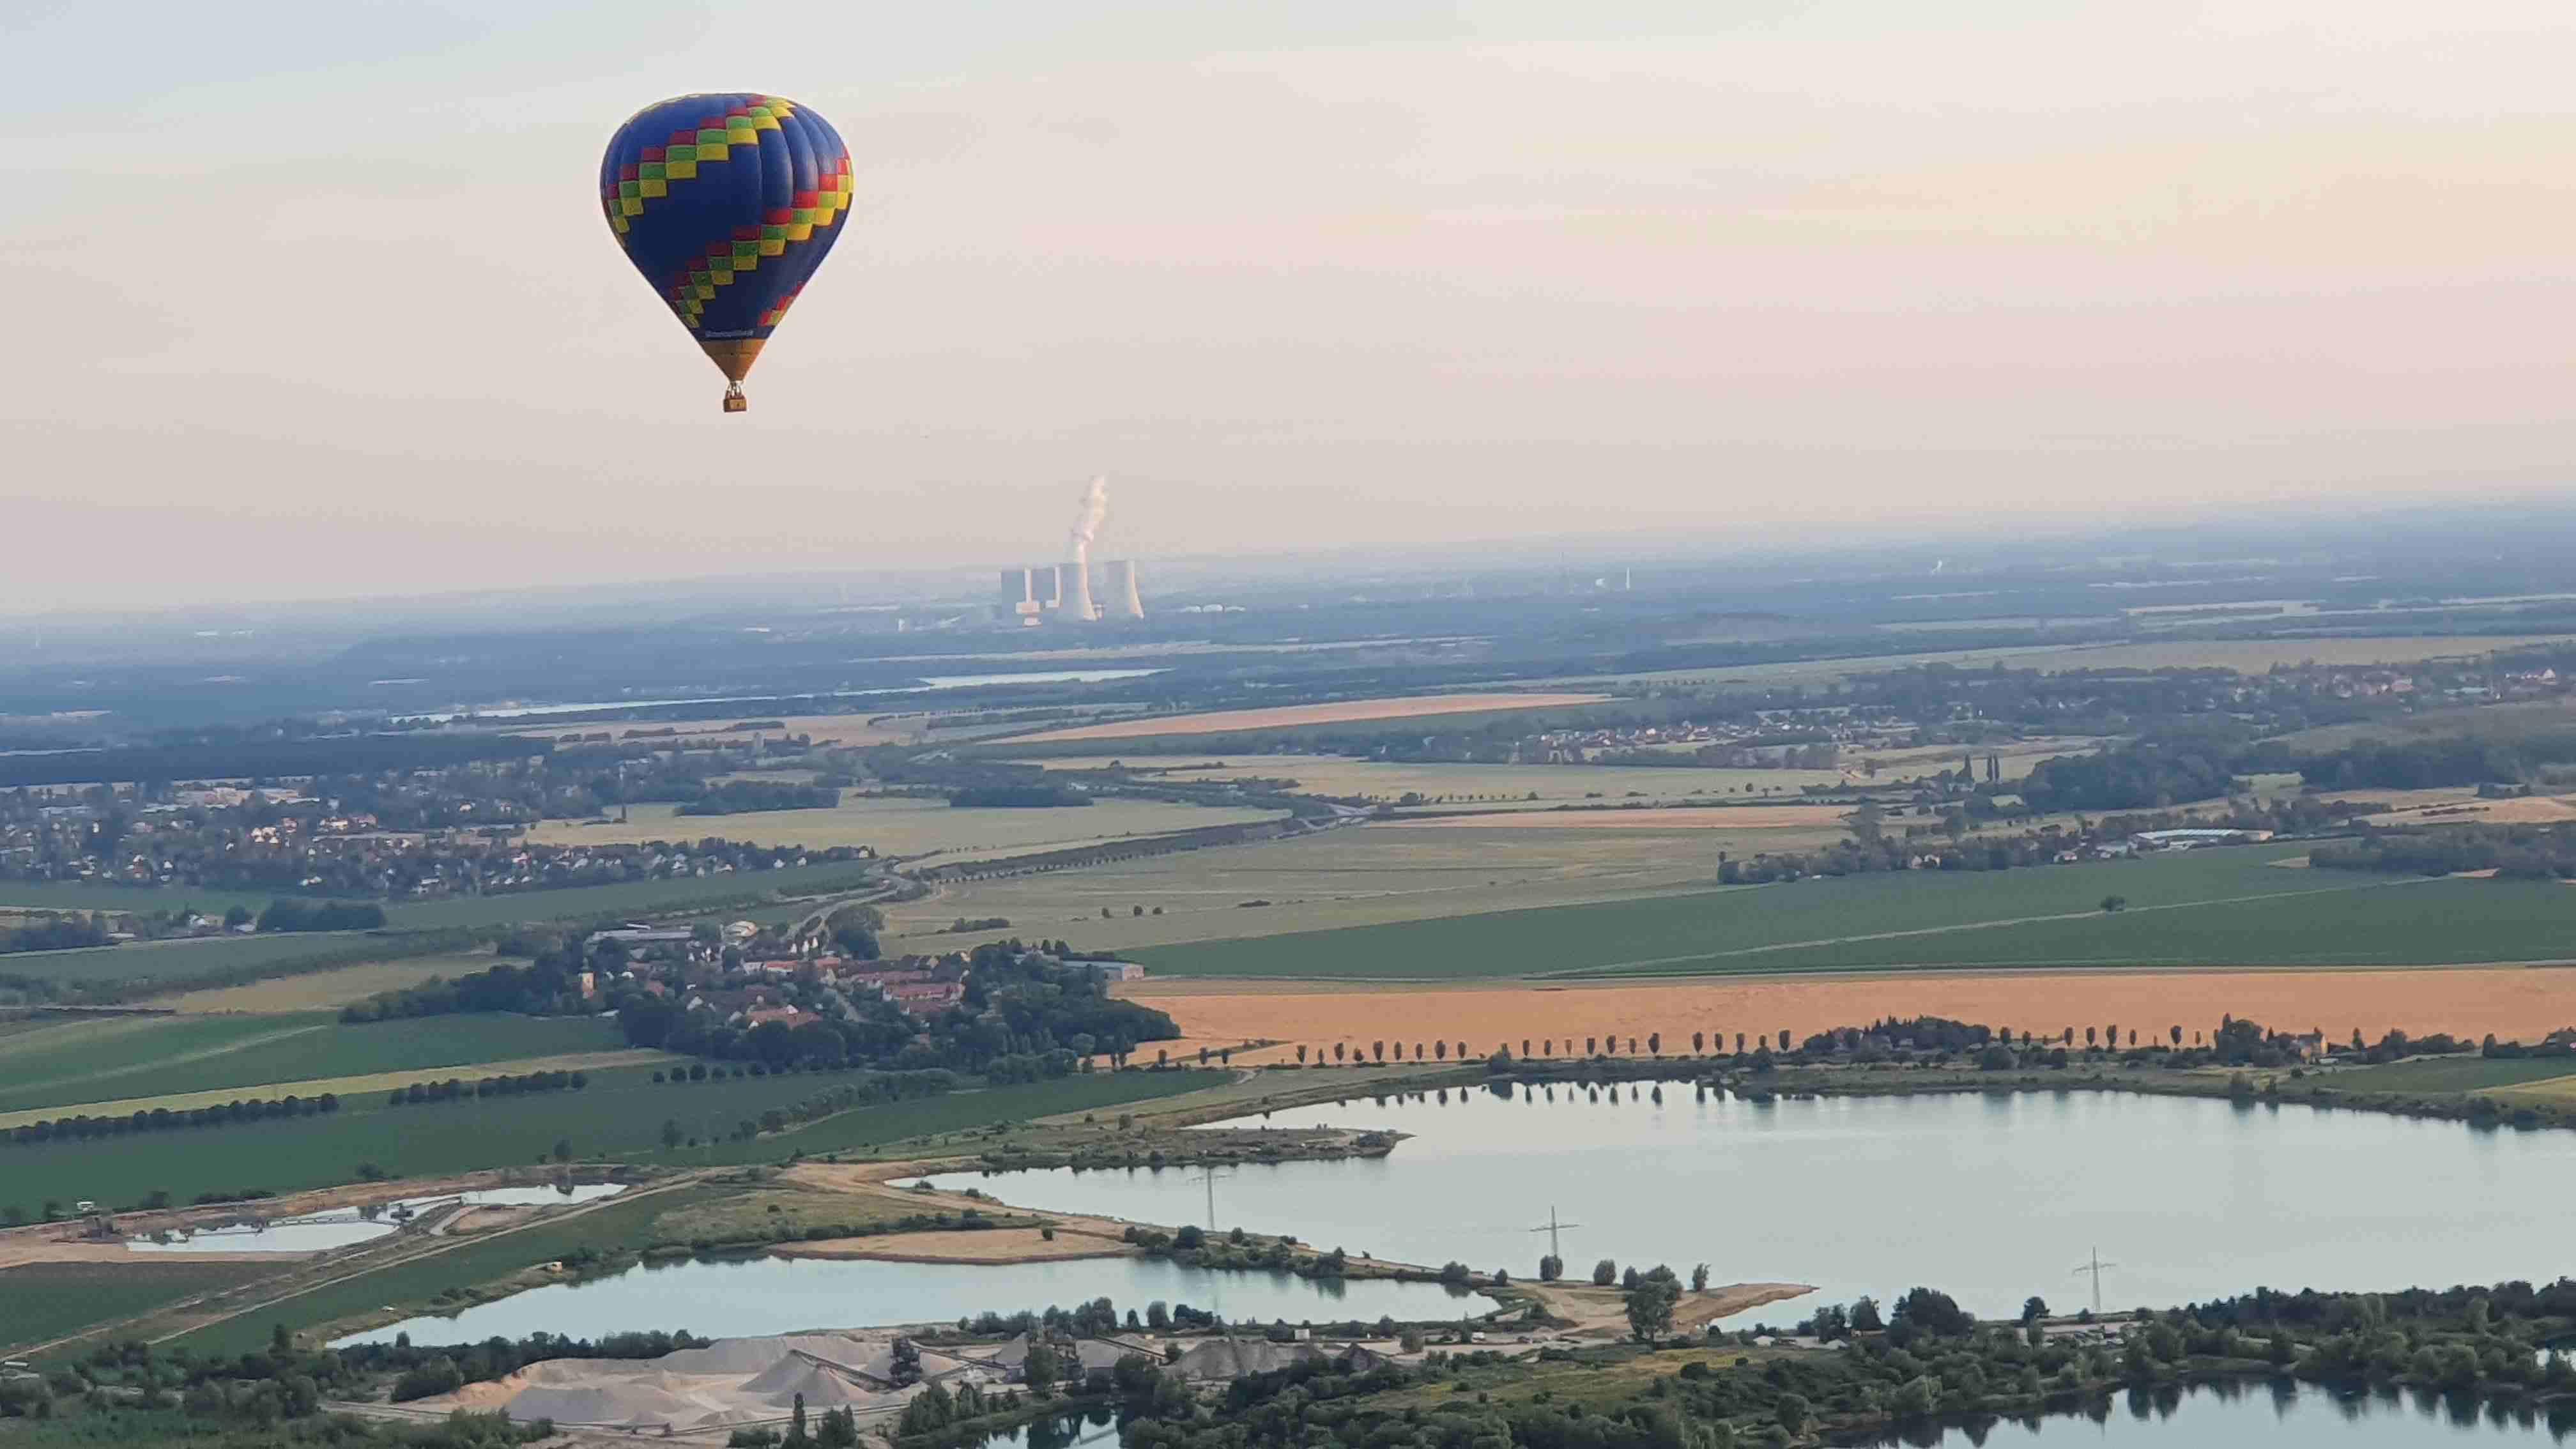 18-26.6.20-Ballonfahrt-Quelle-Foto-Andreas-Lukaschek